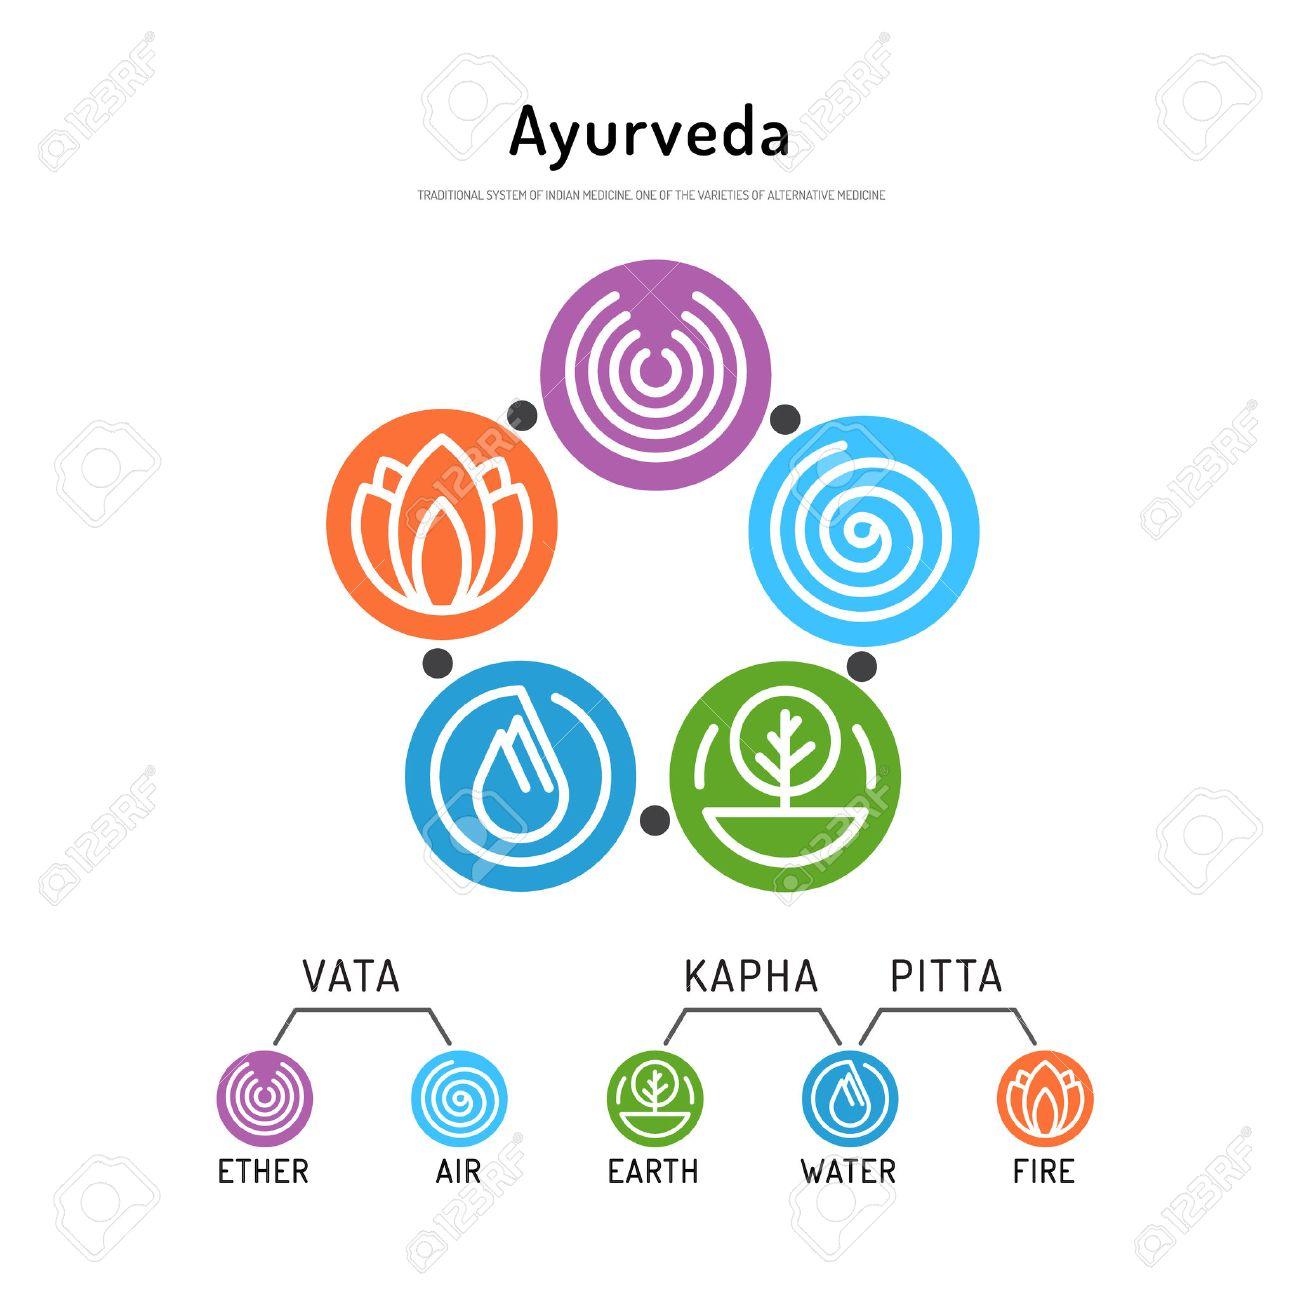 Ayurveda vector illustration doshas vata, pitta, kapha. Ayurvedic body types. Ayurvedic infographic. Healthy lifestyle. Harmony with nature. - 57998045